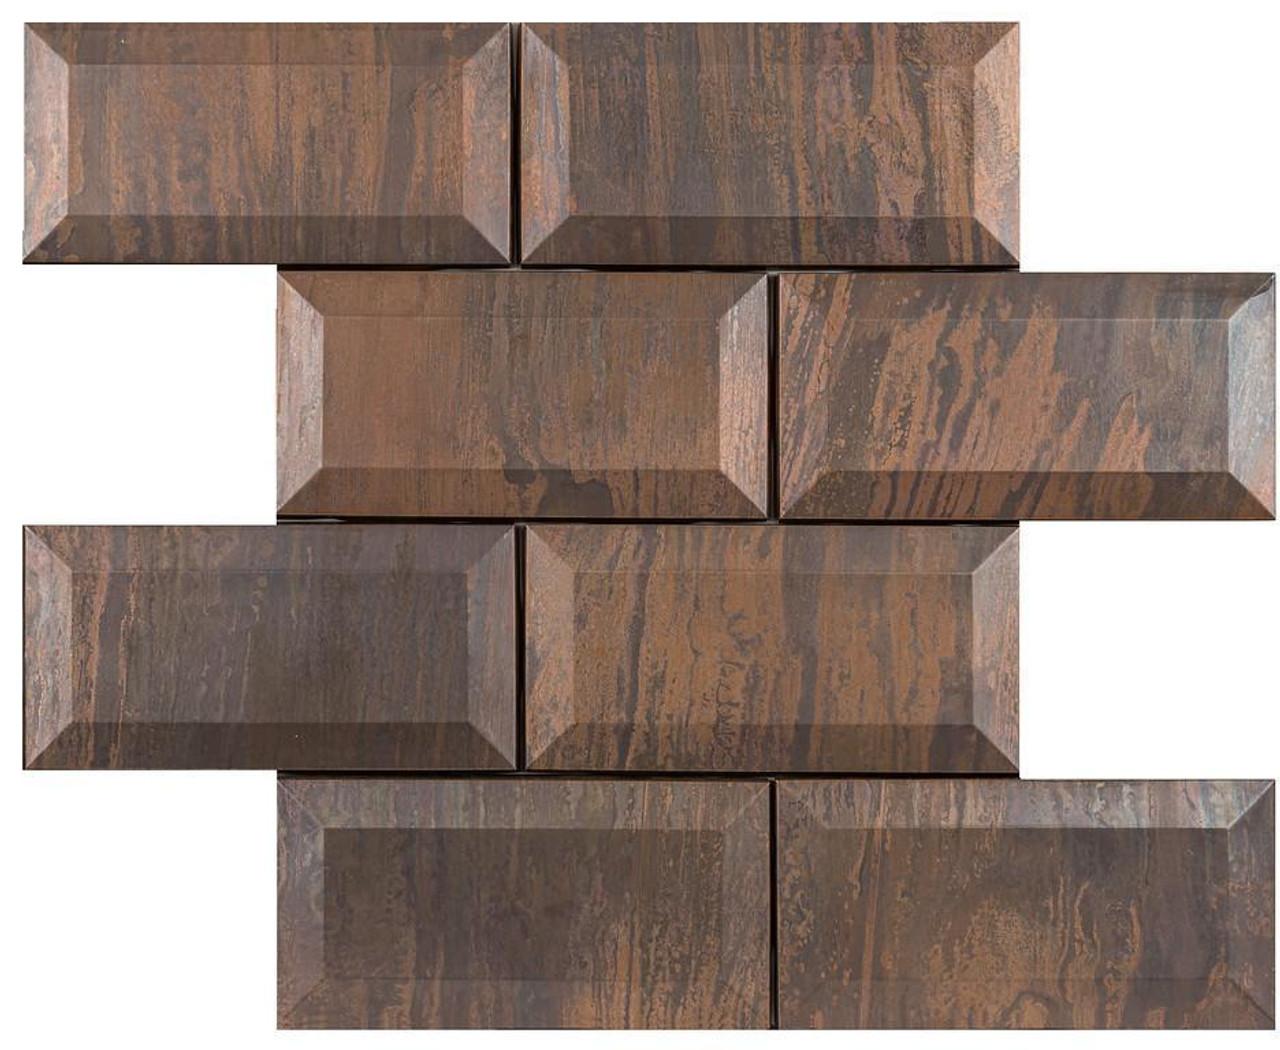 UBC Antique Copper Tile Backsplash 3 x 6 Bevel Mosaic